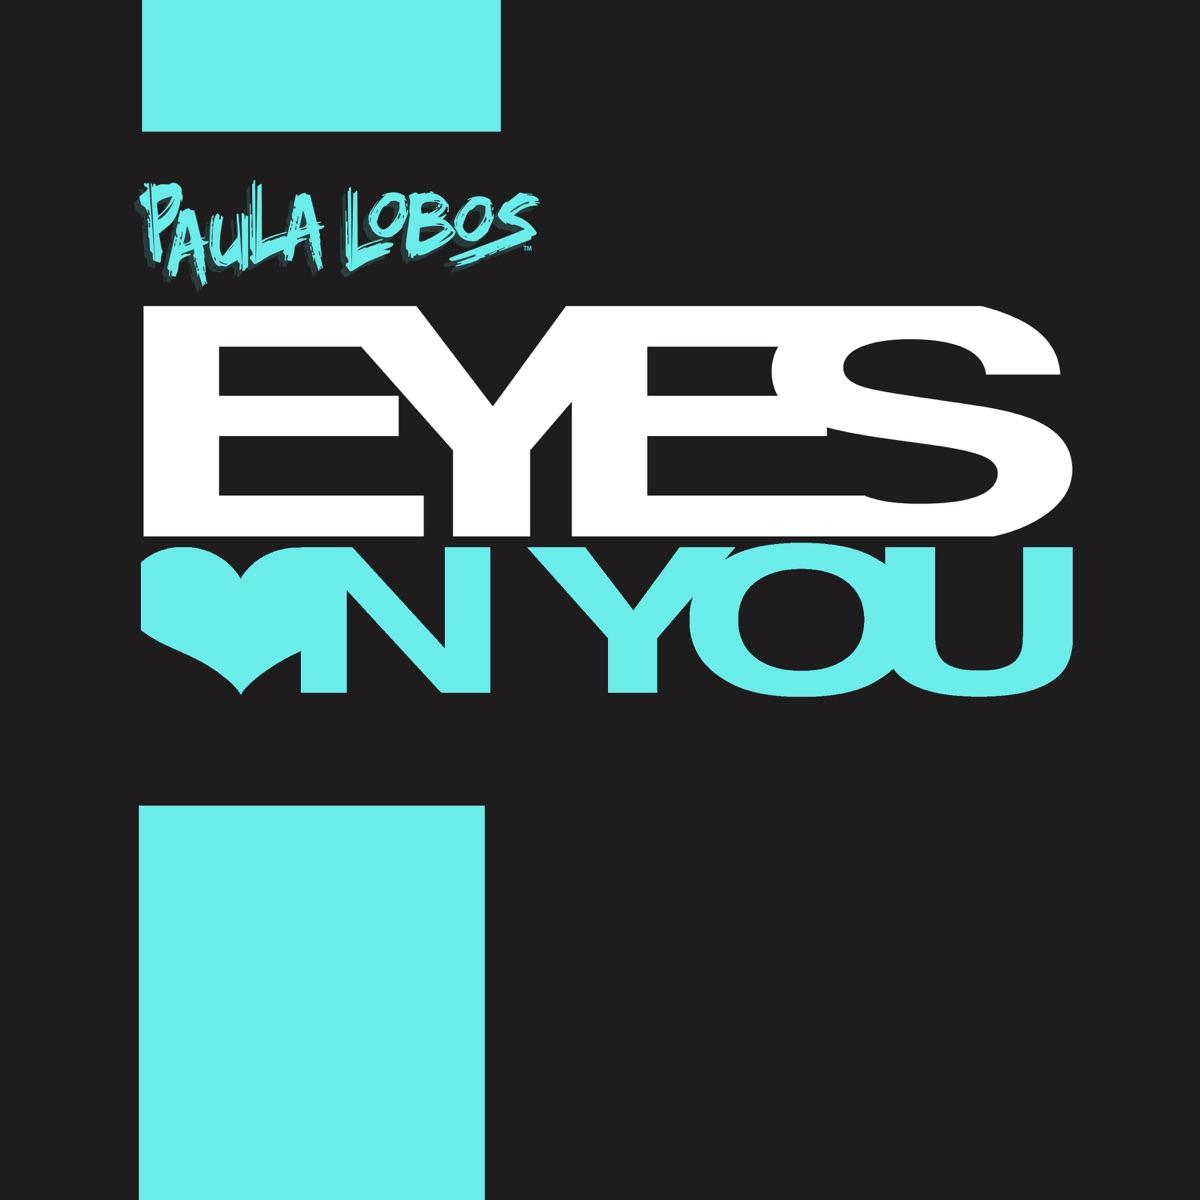 Eyes on You - EP Paula Lobos CD cover